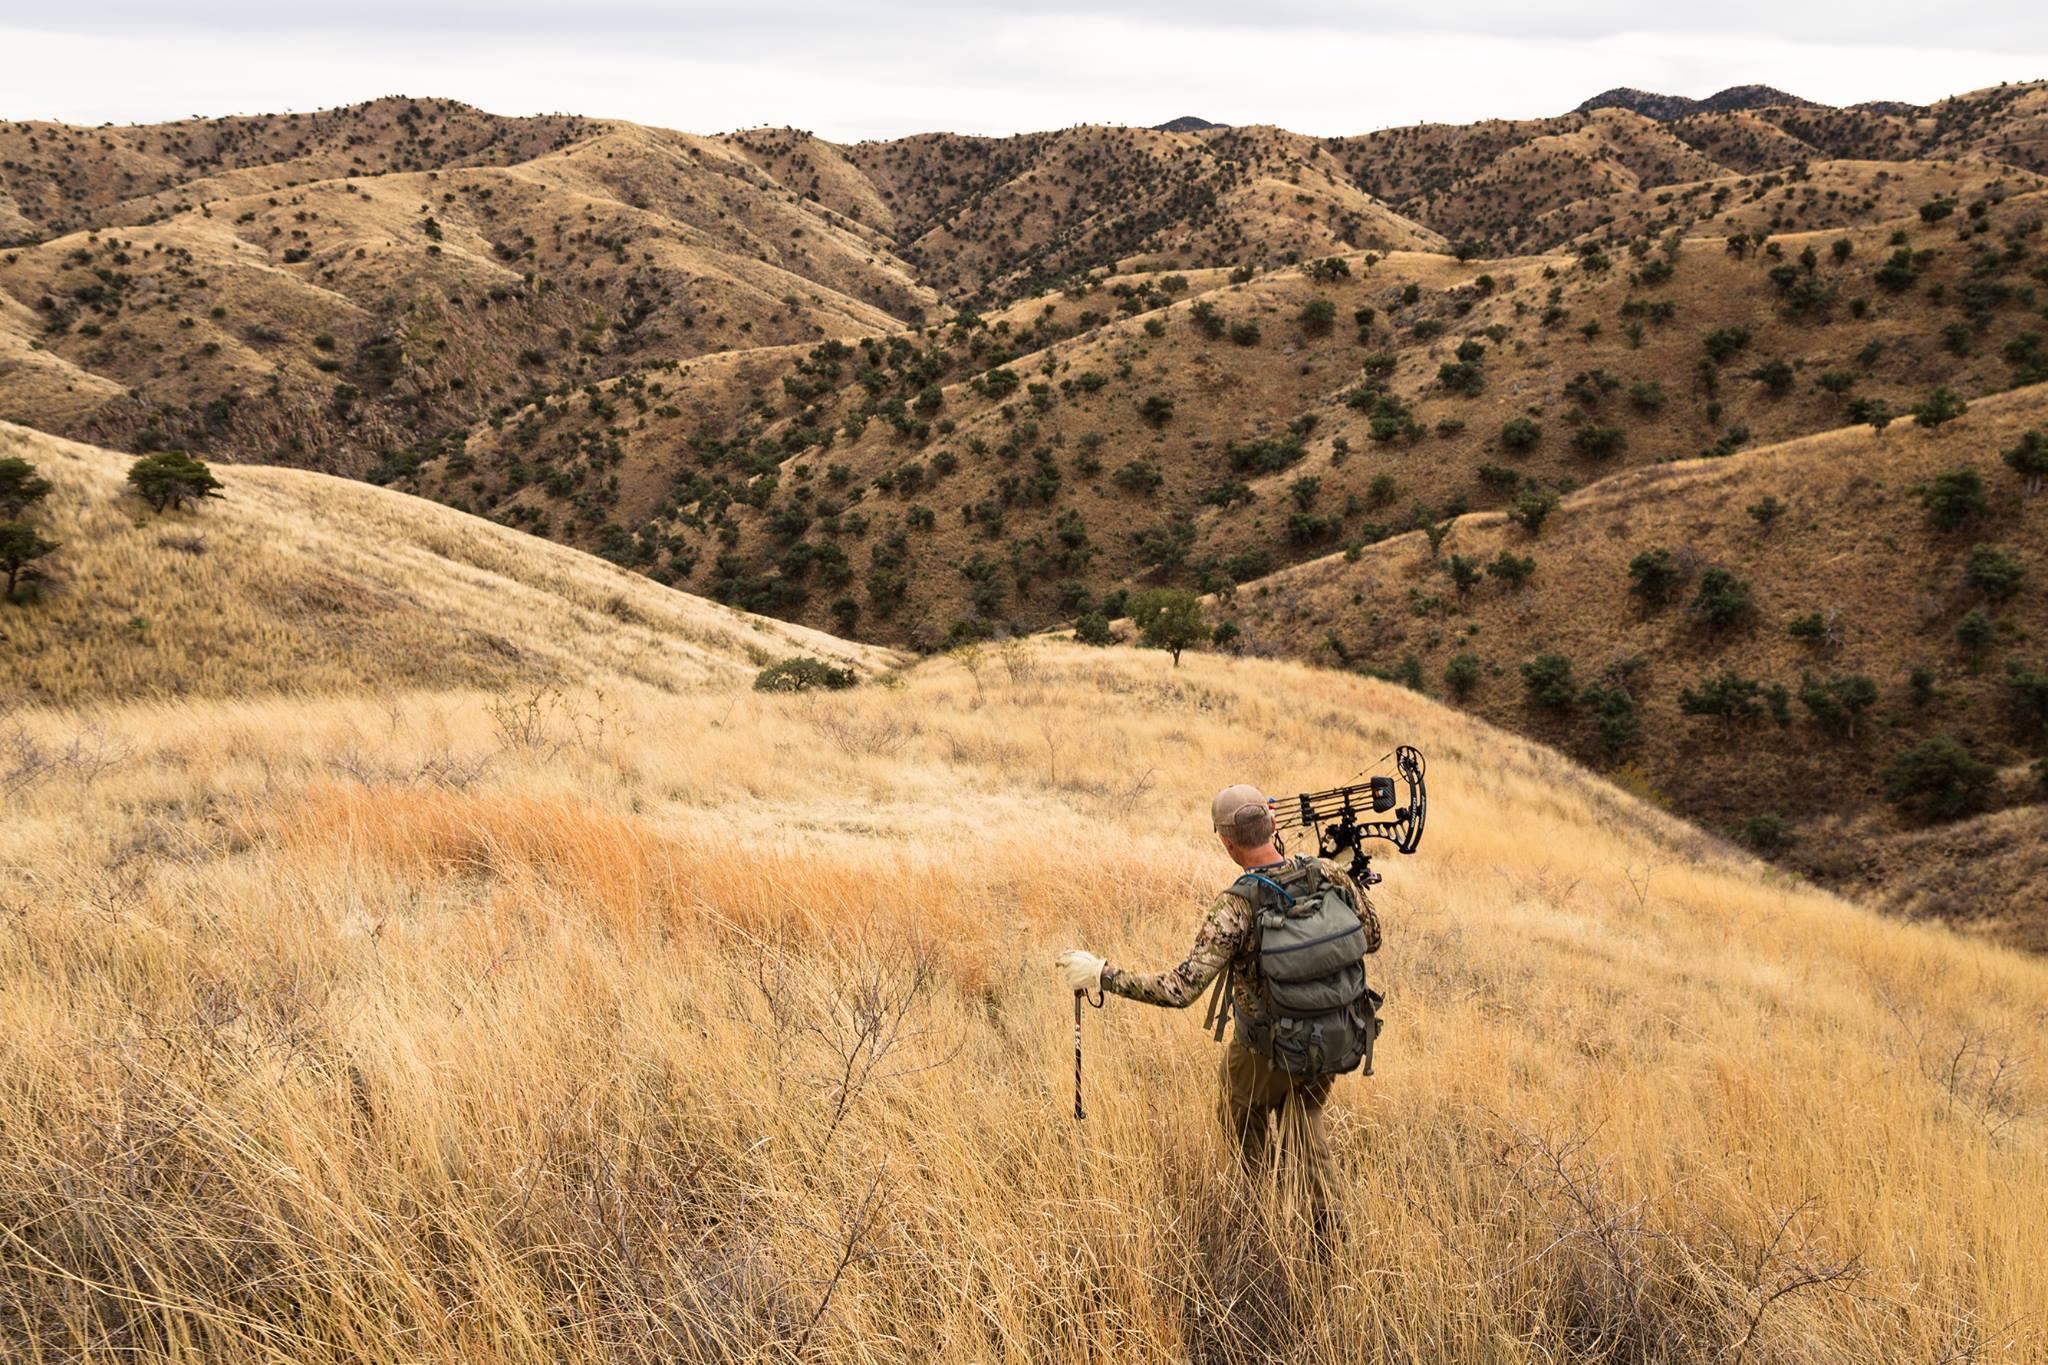 Randy-Newberg-hunter-podcast-videos-watch-outdoors-waypointtv.jpg